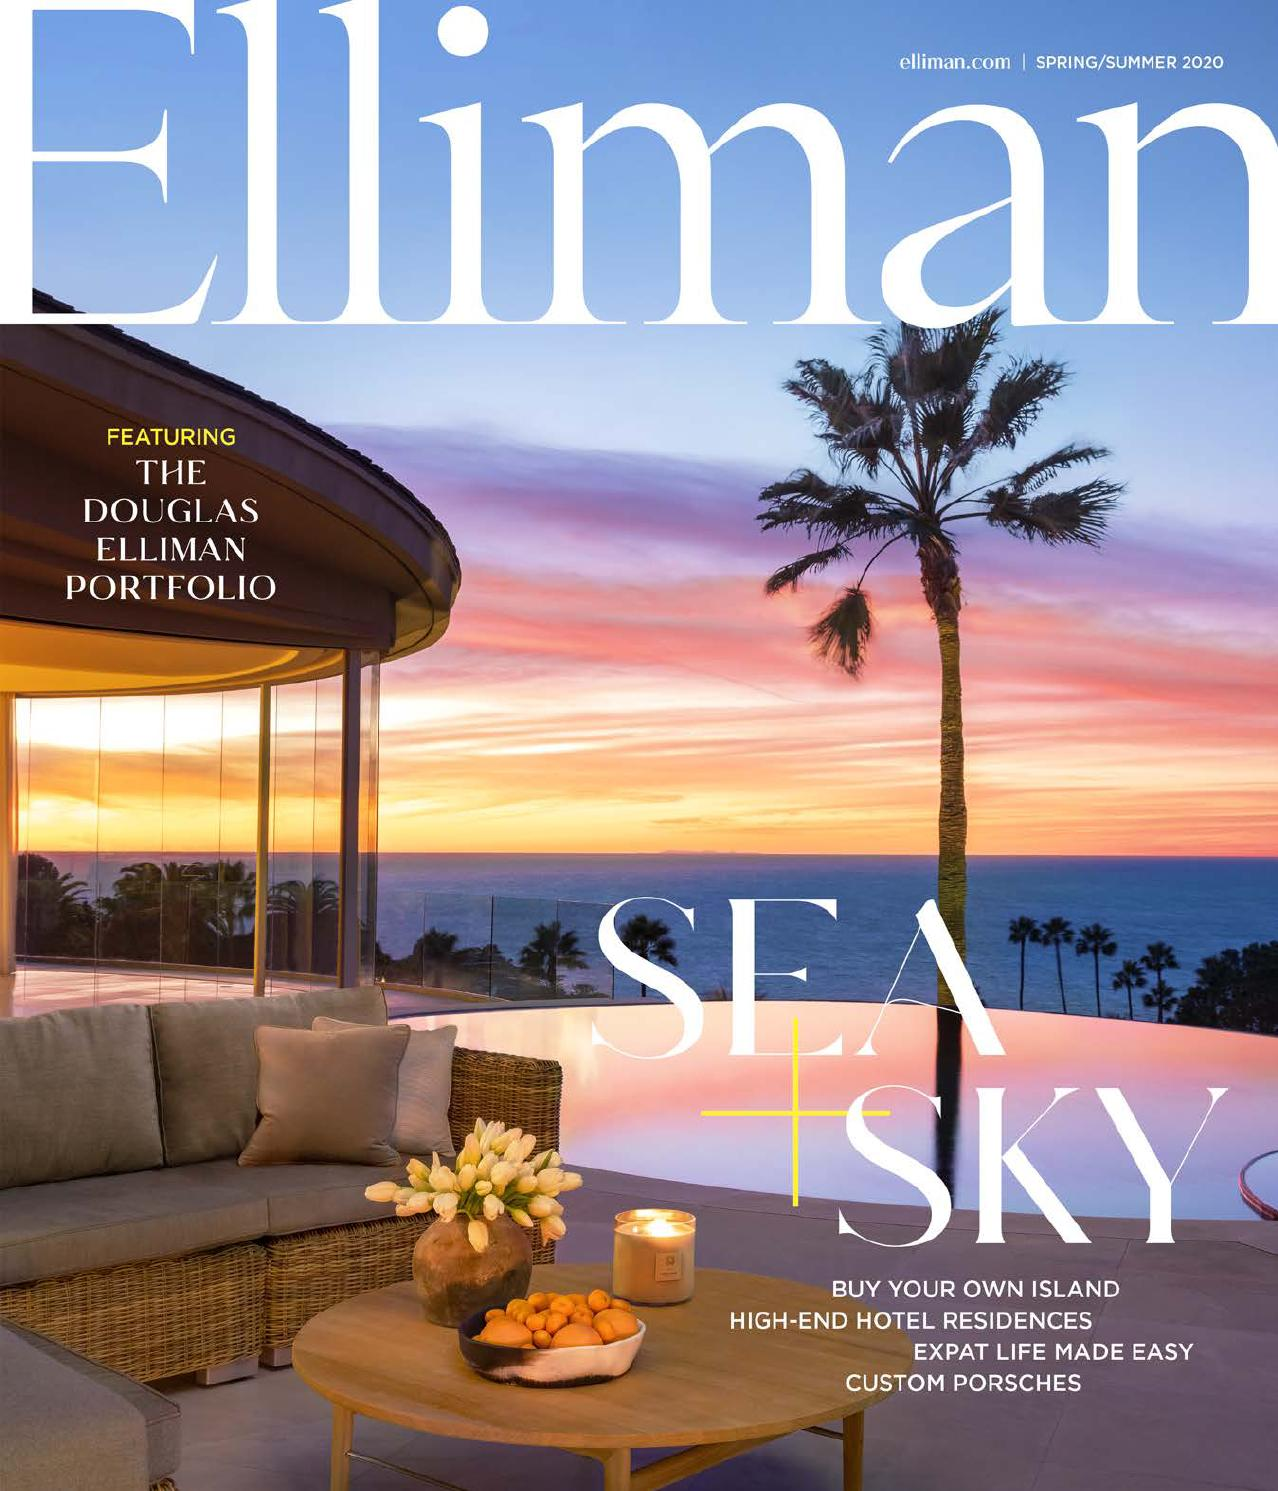 Elliman Magazine Spring Summer 2020 Issue Katia Reisler By Reislerluxuryhomes Issuu